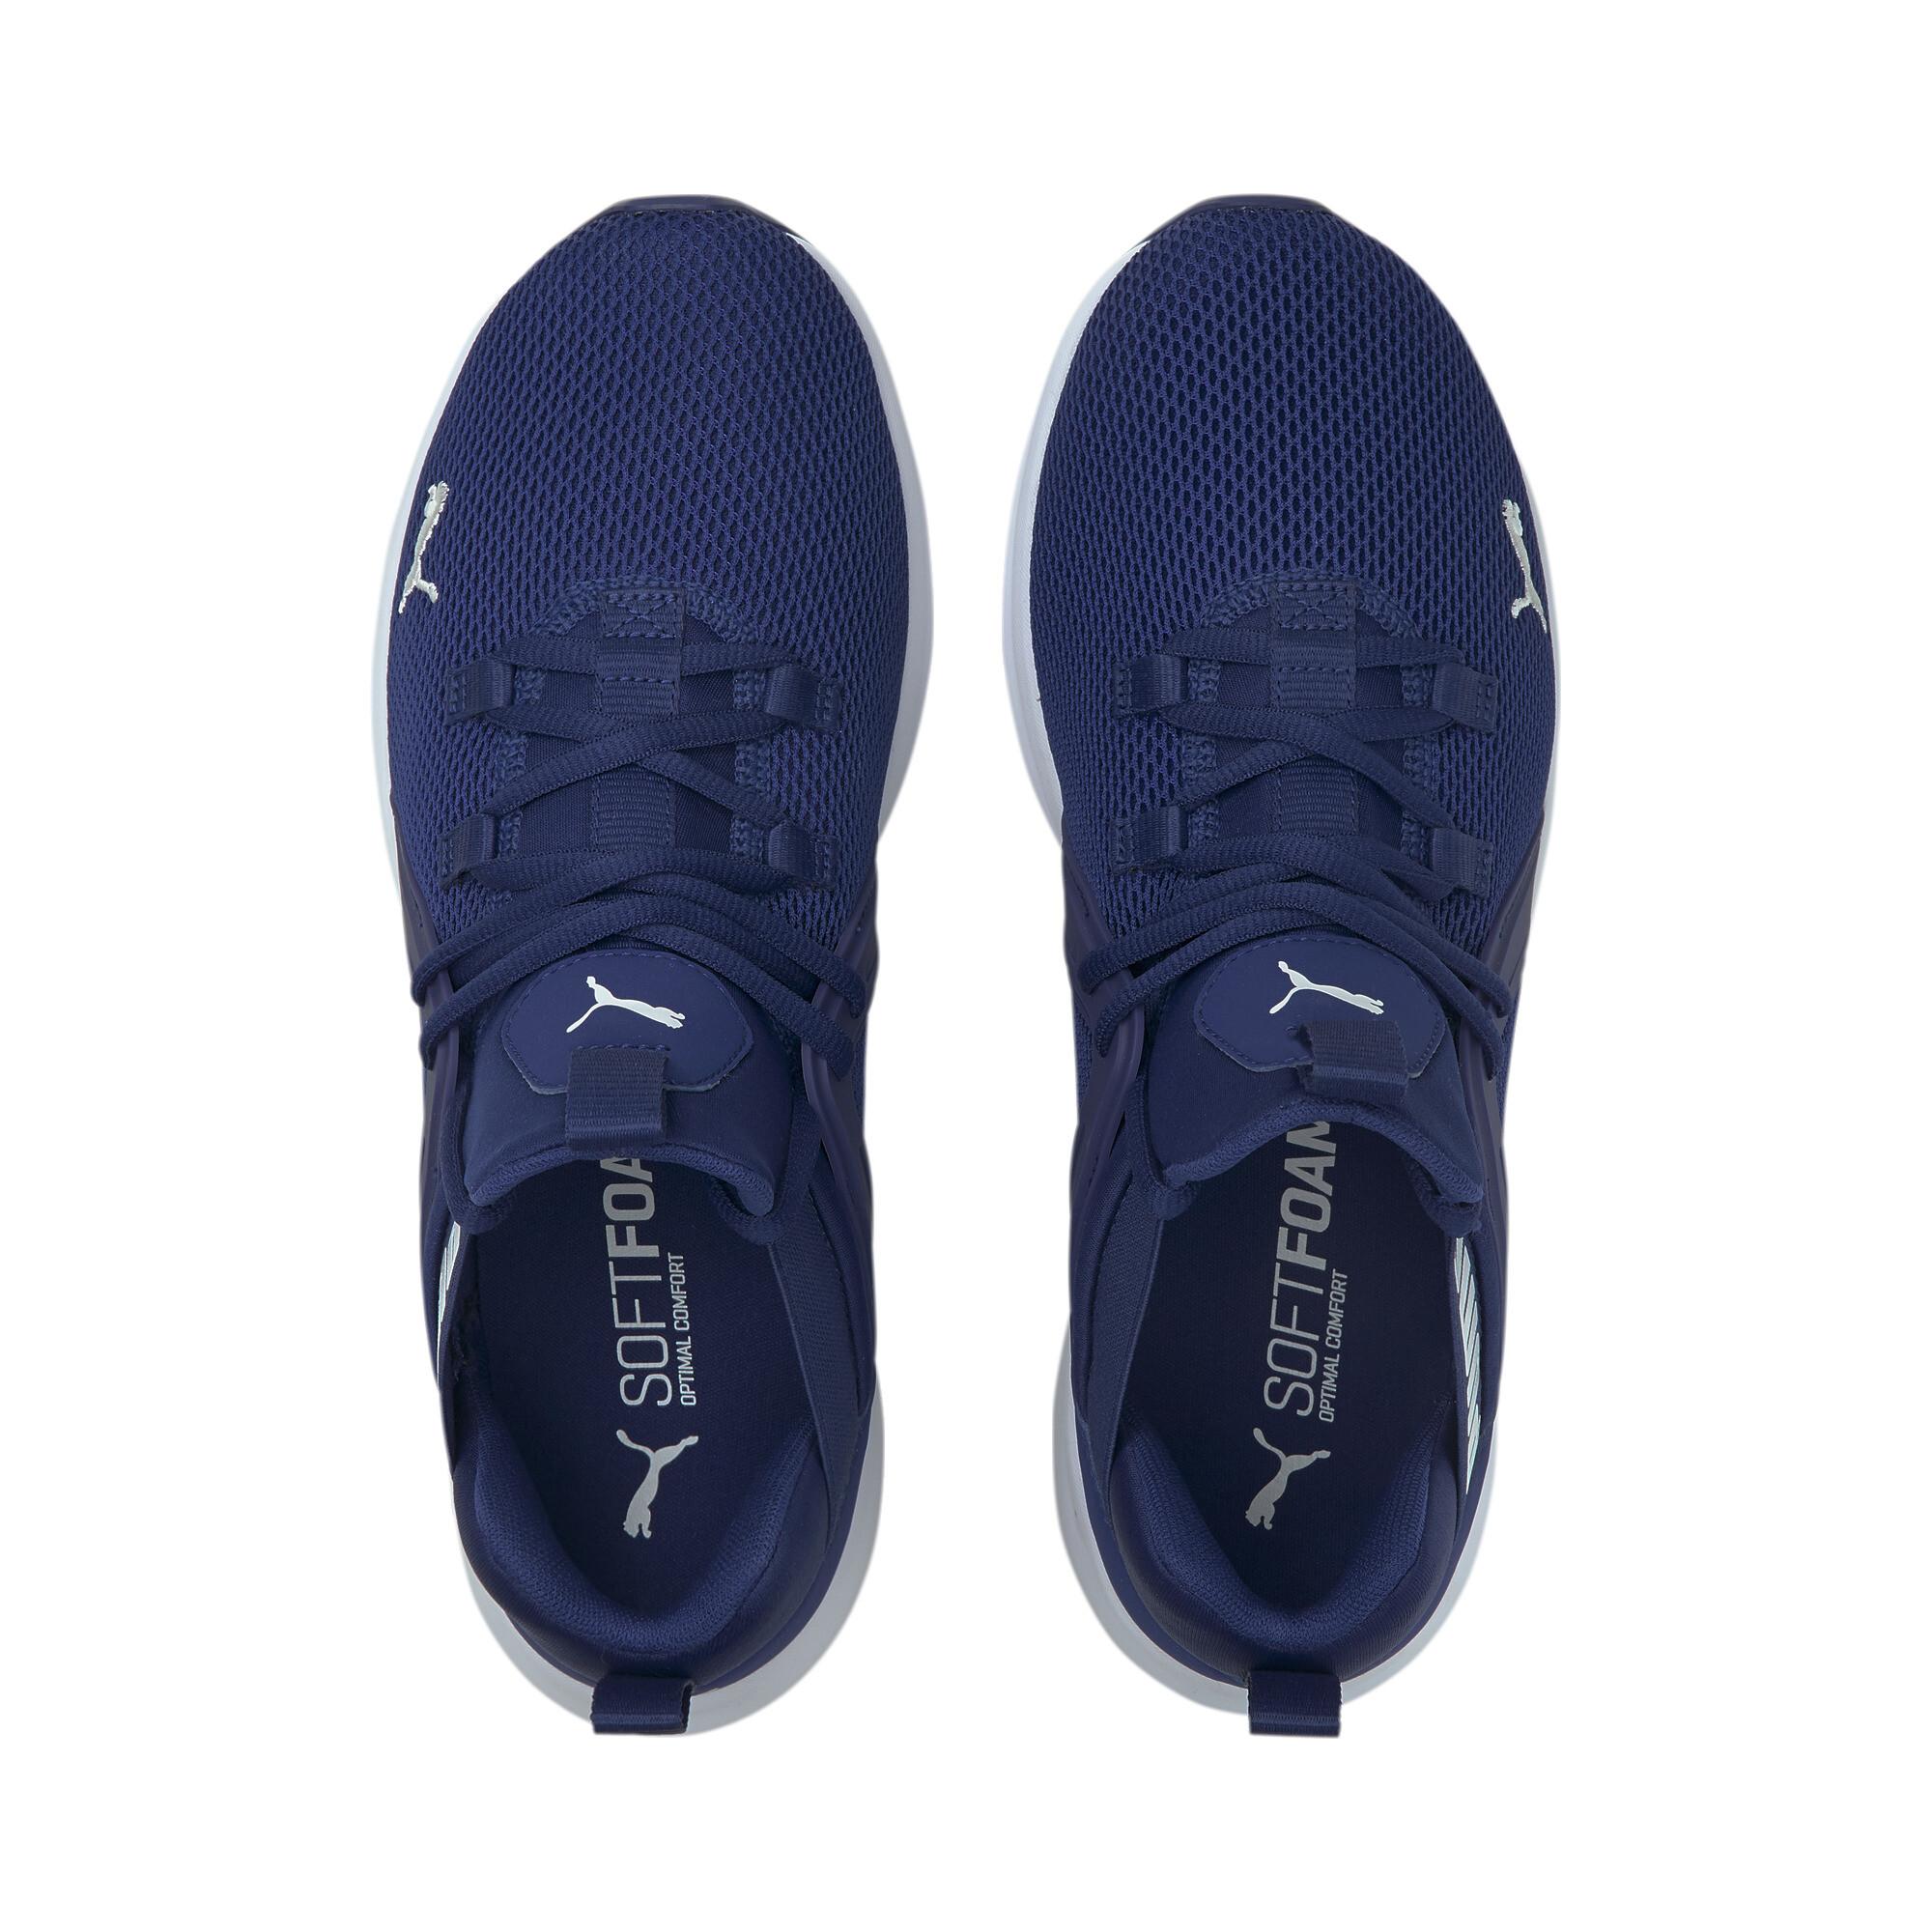 thumbnail 58 - PUMA Men's Enzo 2 Training Shoes